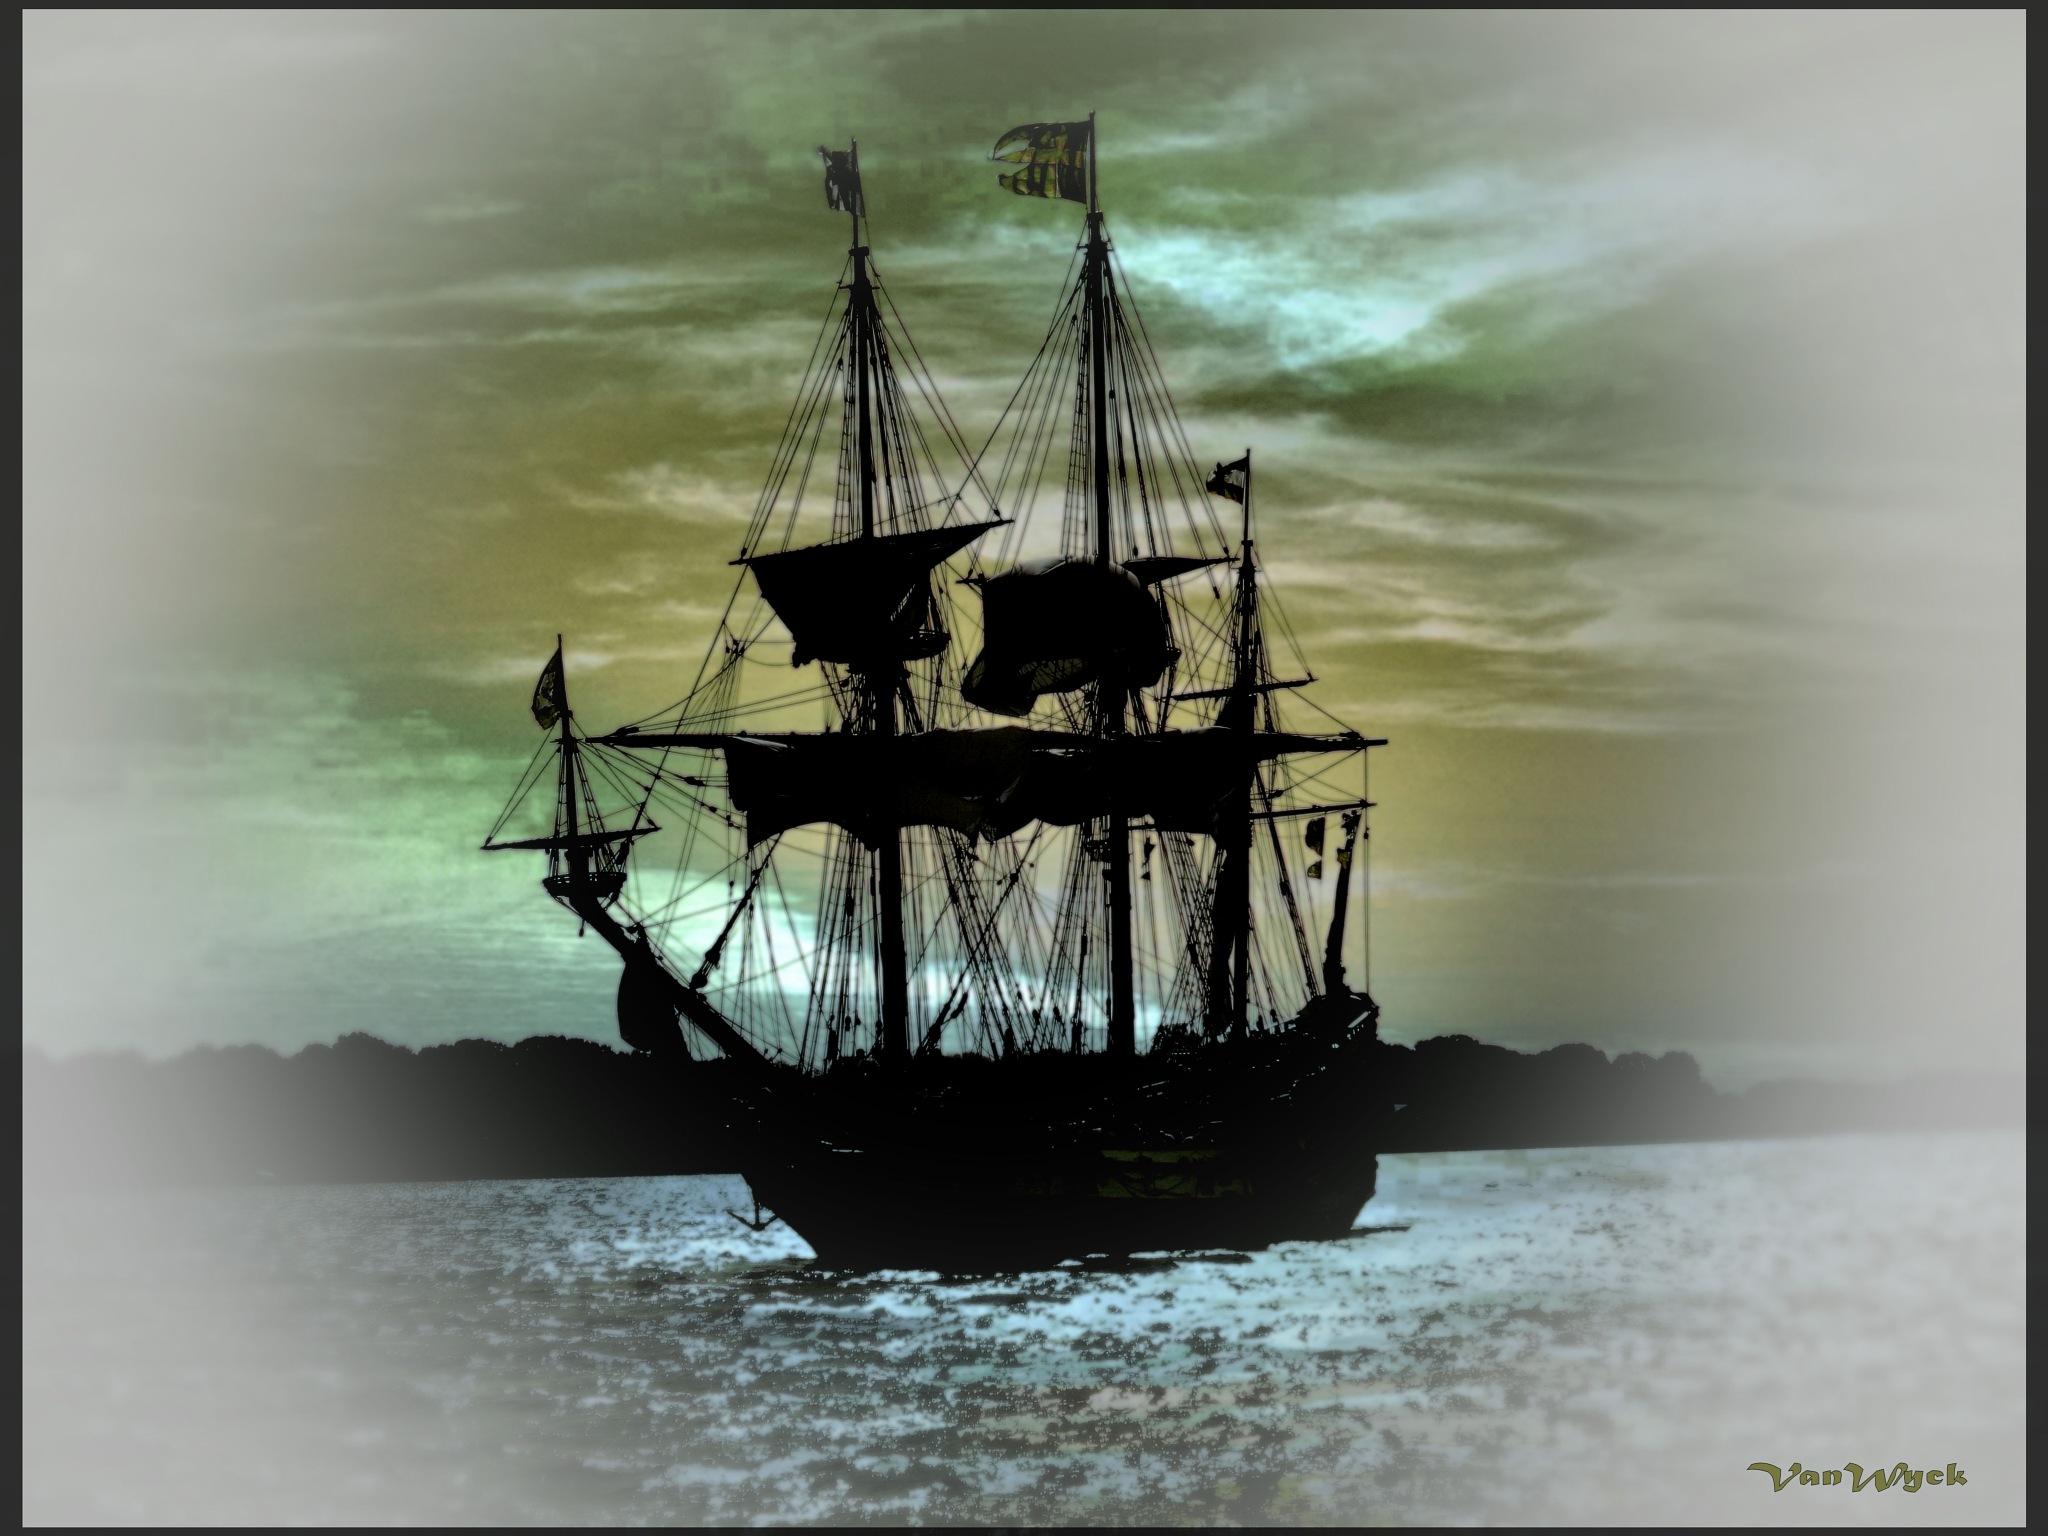 Ship of dreams by VanWyck